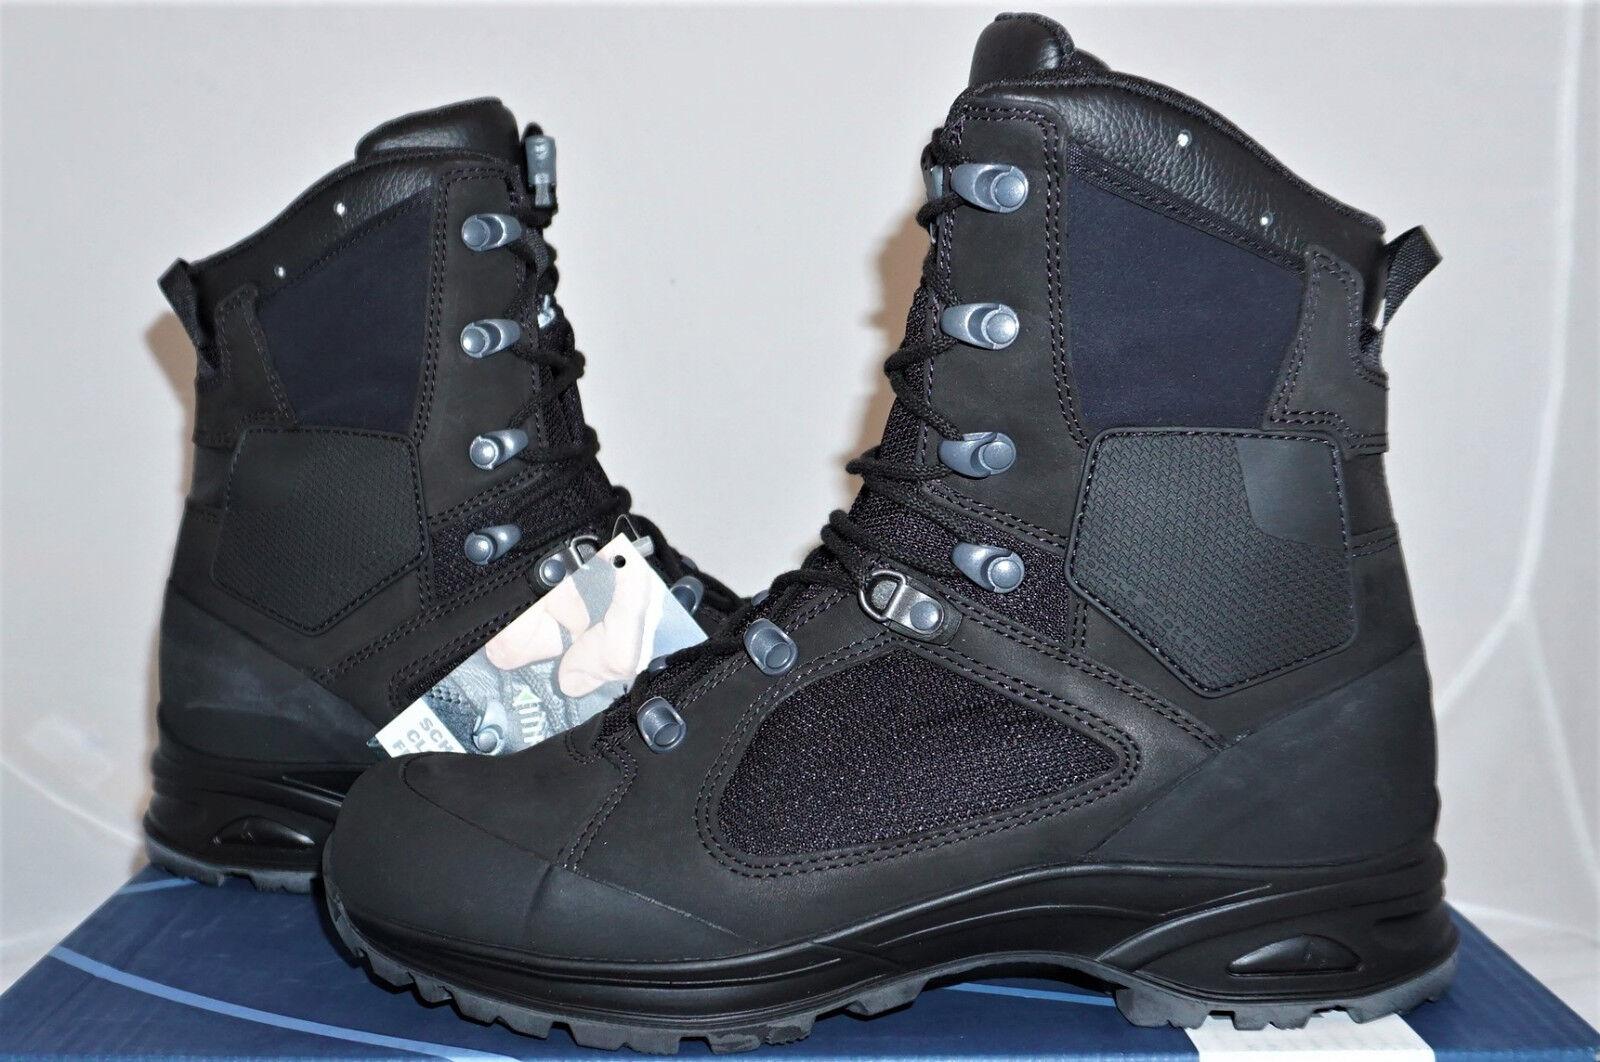 Haix Nepal Pro schwarz UK 7 EU 41 US 8 Kampfstiefel Wanderstiefel Leder NEU